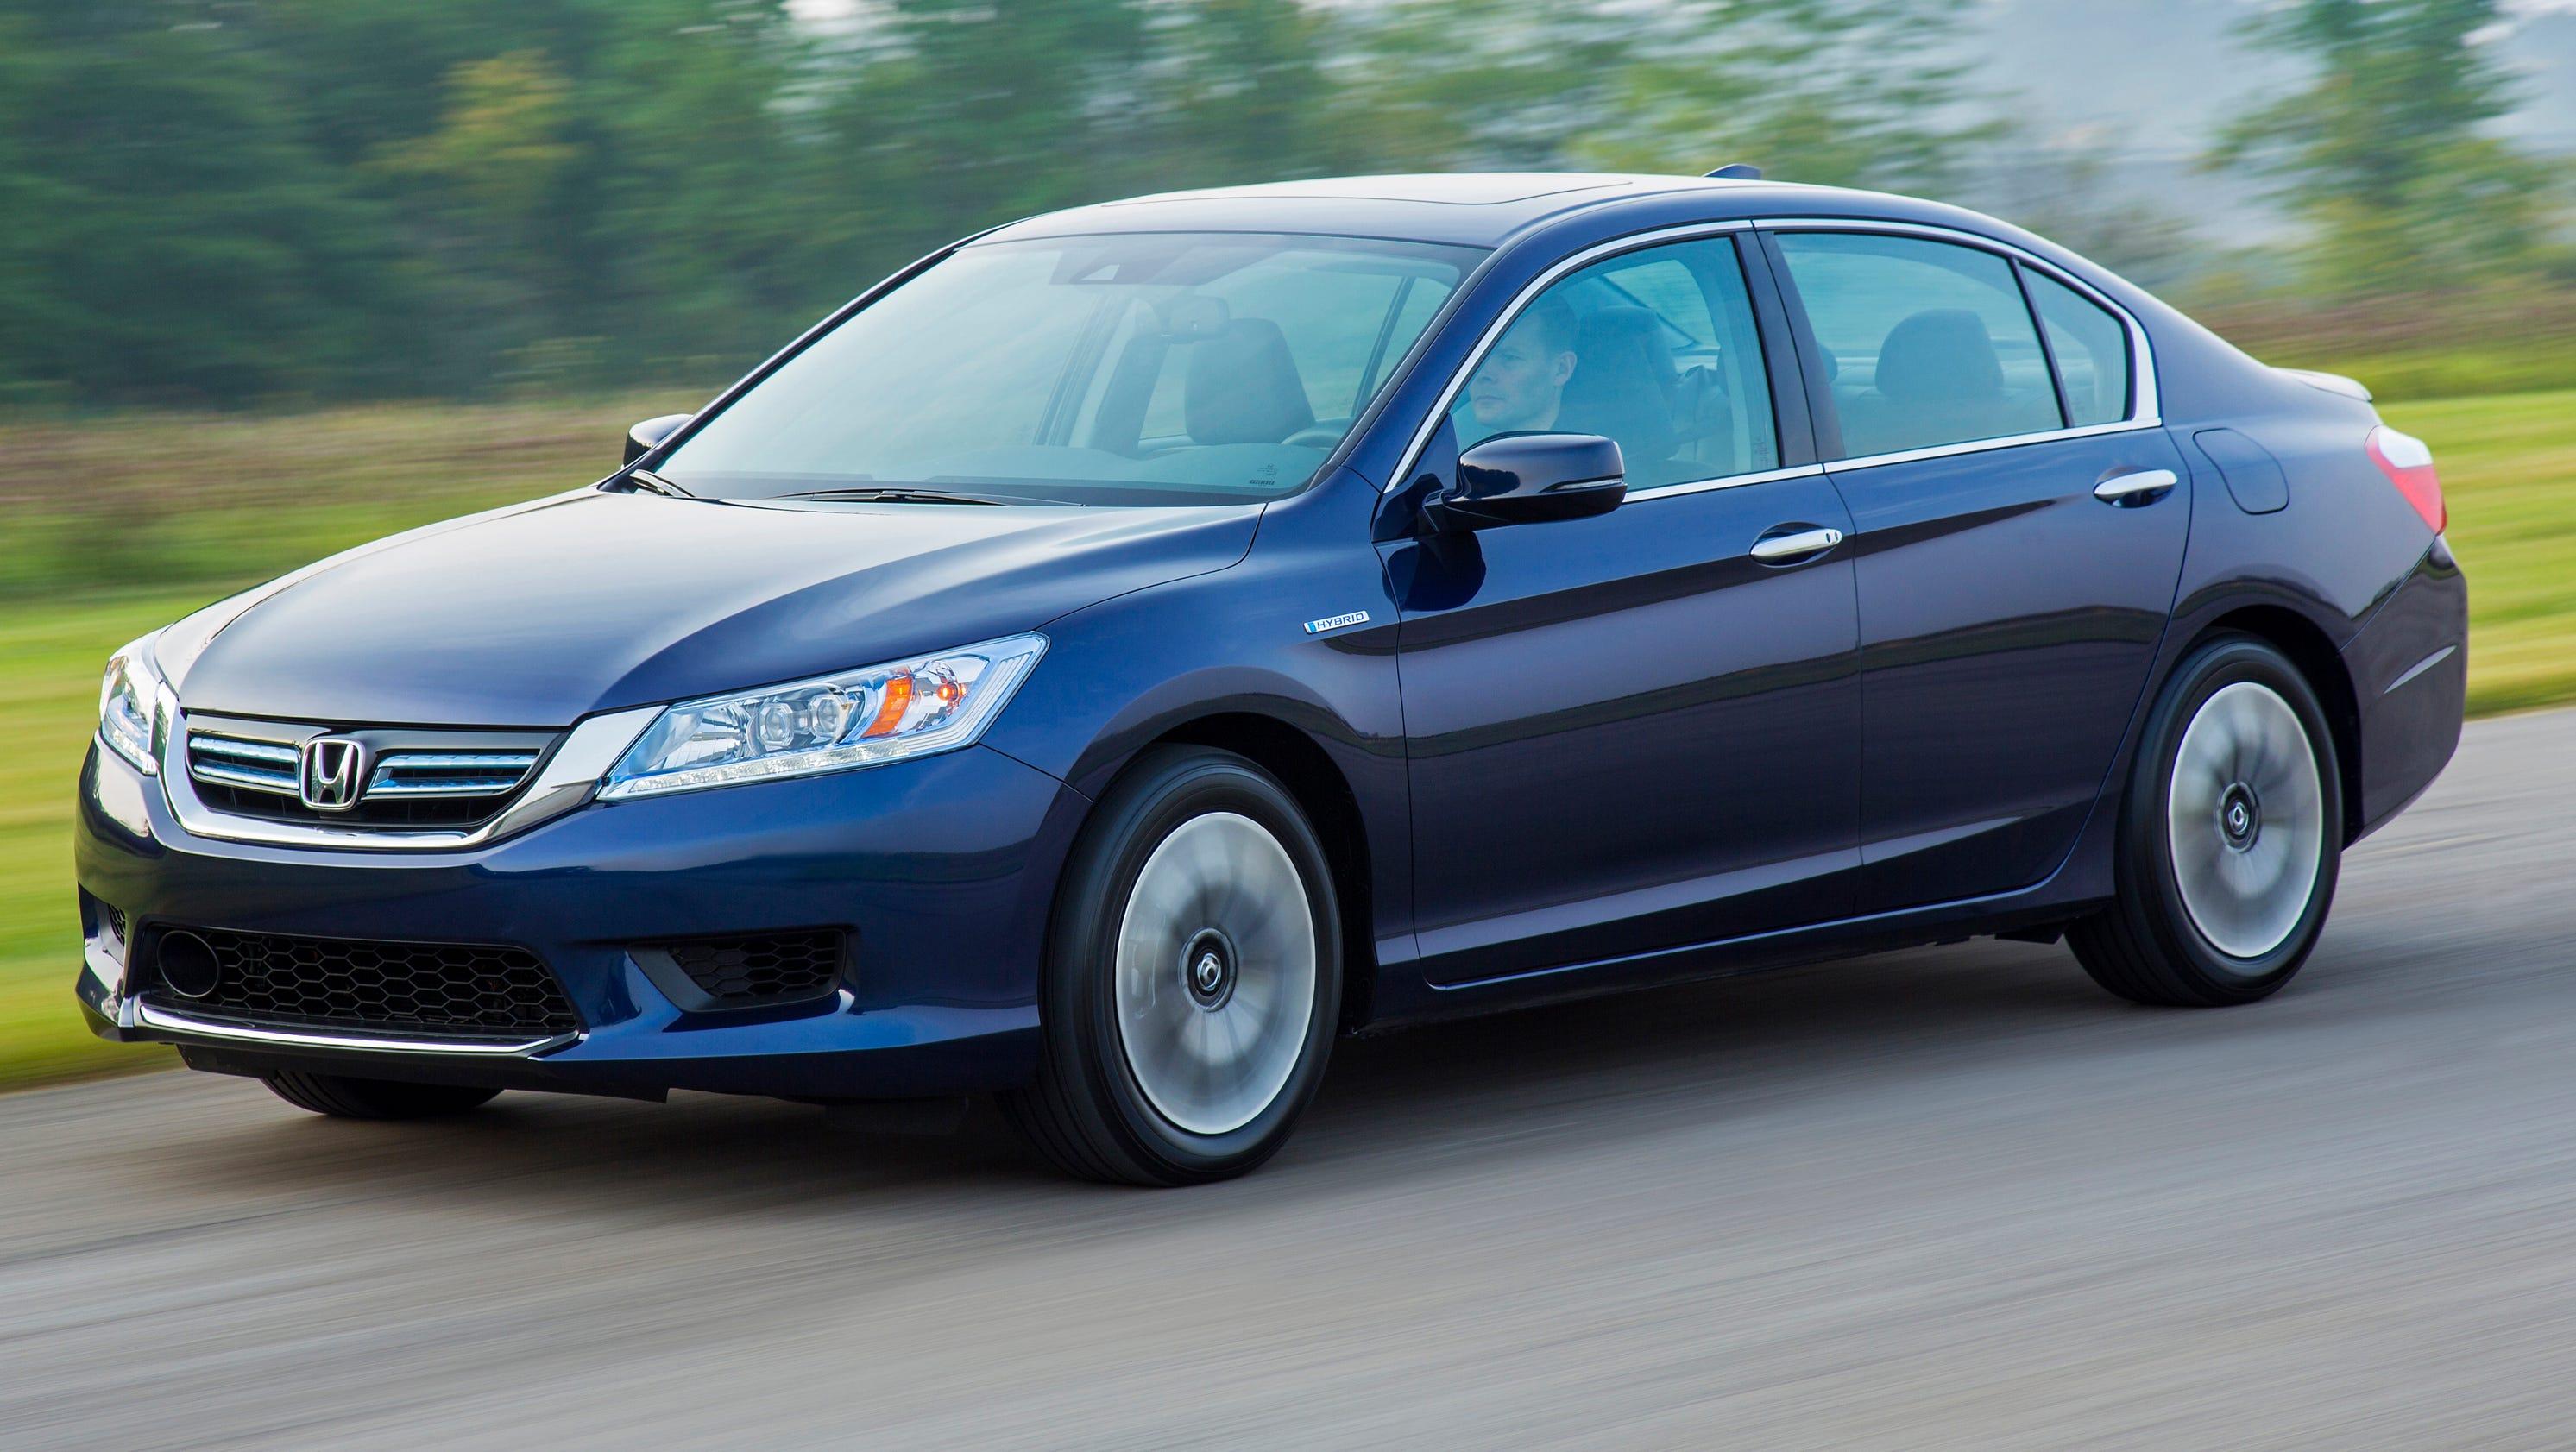 CR\': Honda Accord hybrid mpg rating way off